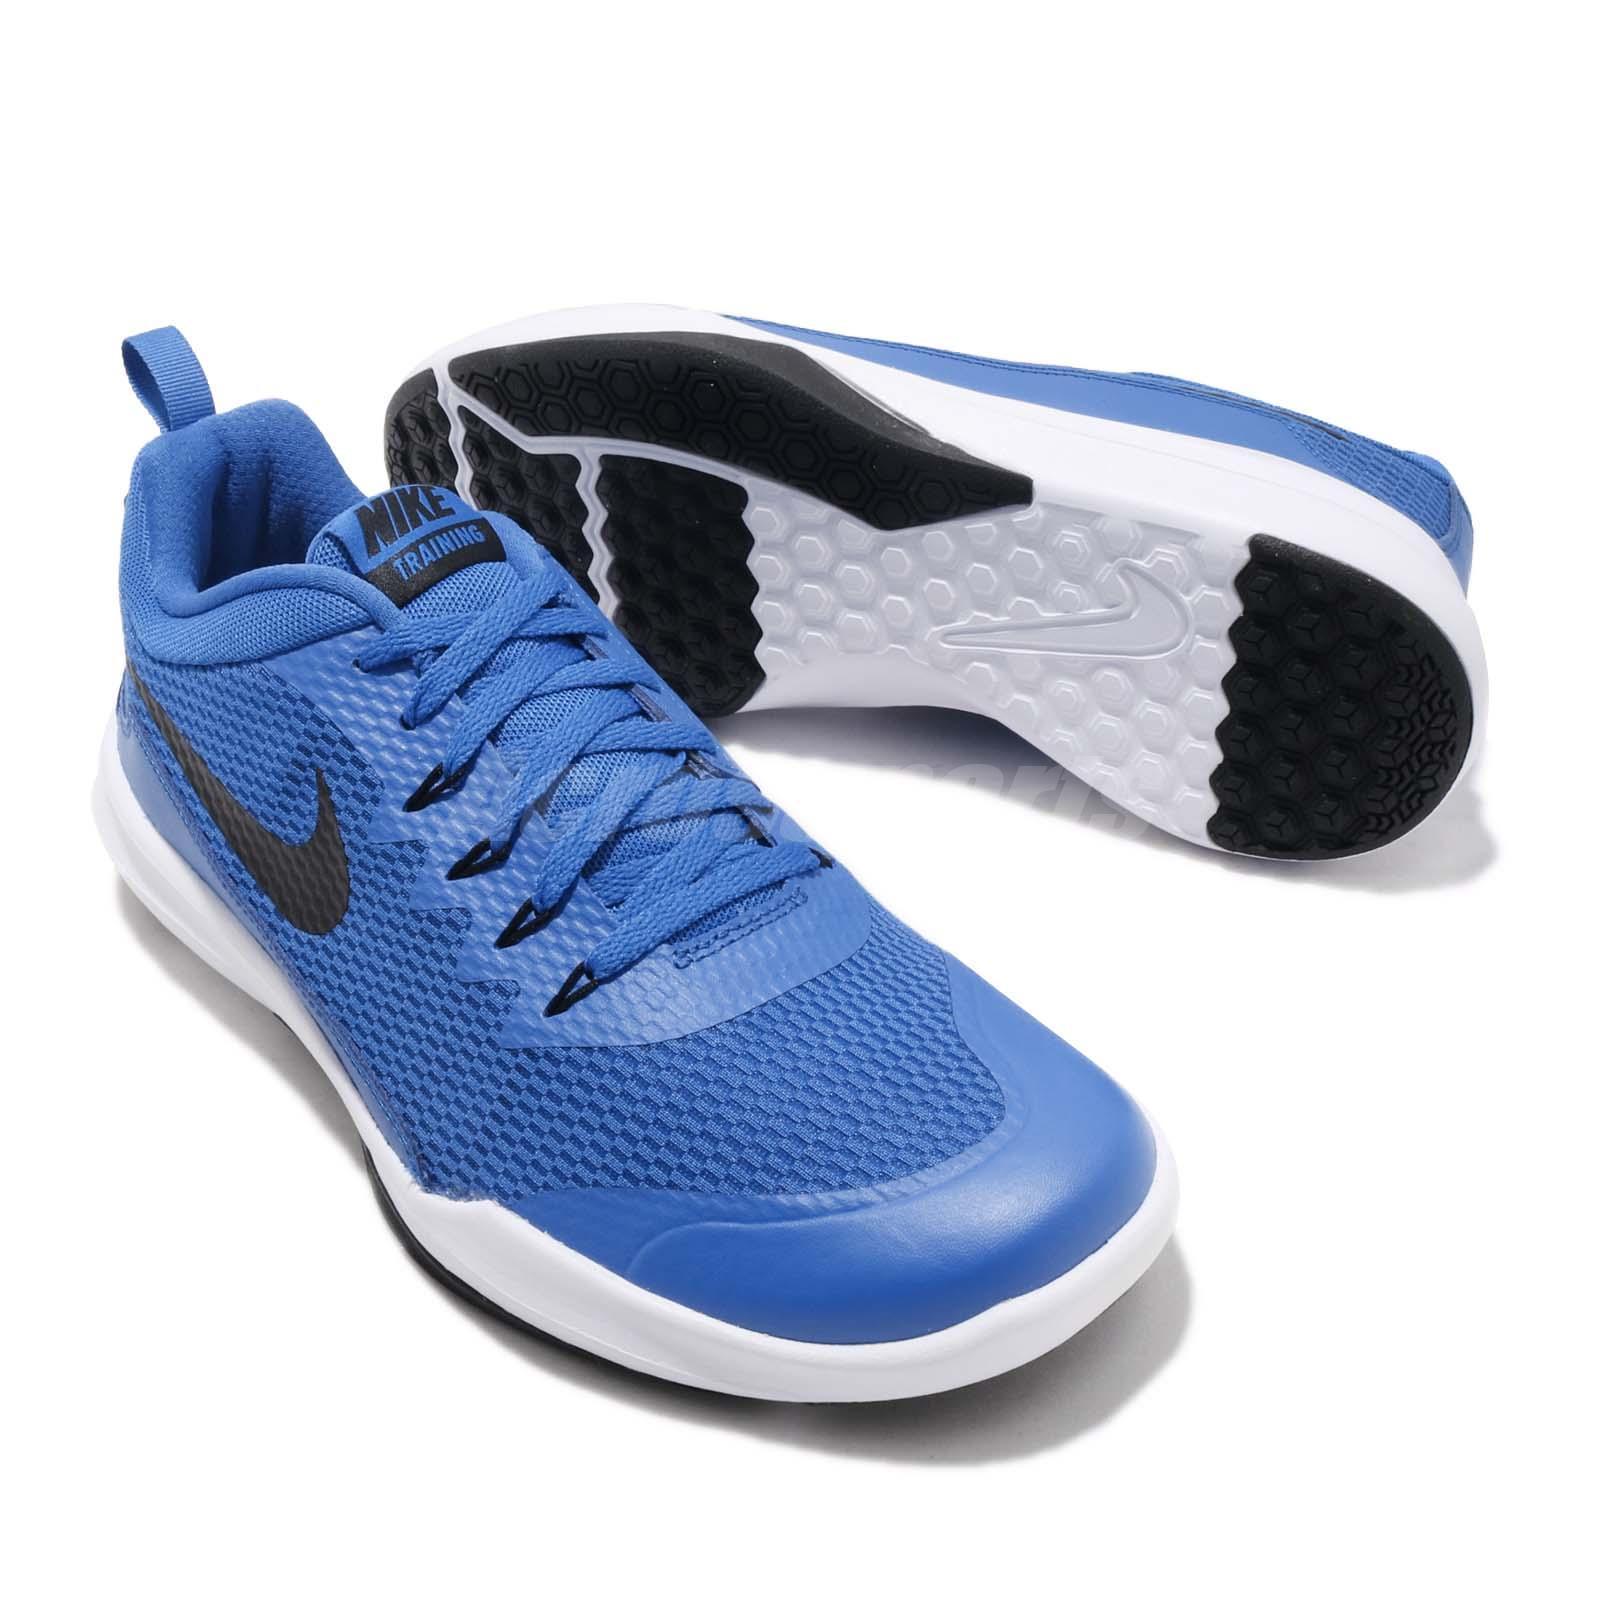 df30460d289 Nike Legend Trainer Signal Blue White Men Cross Training Shoe ...